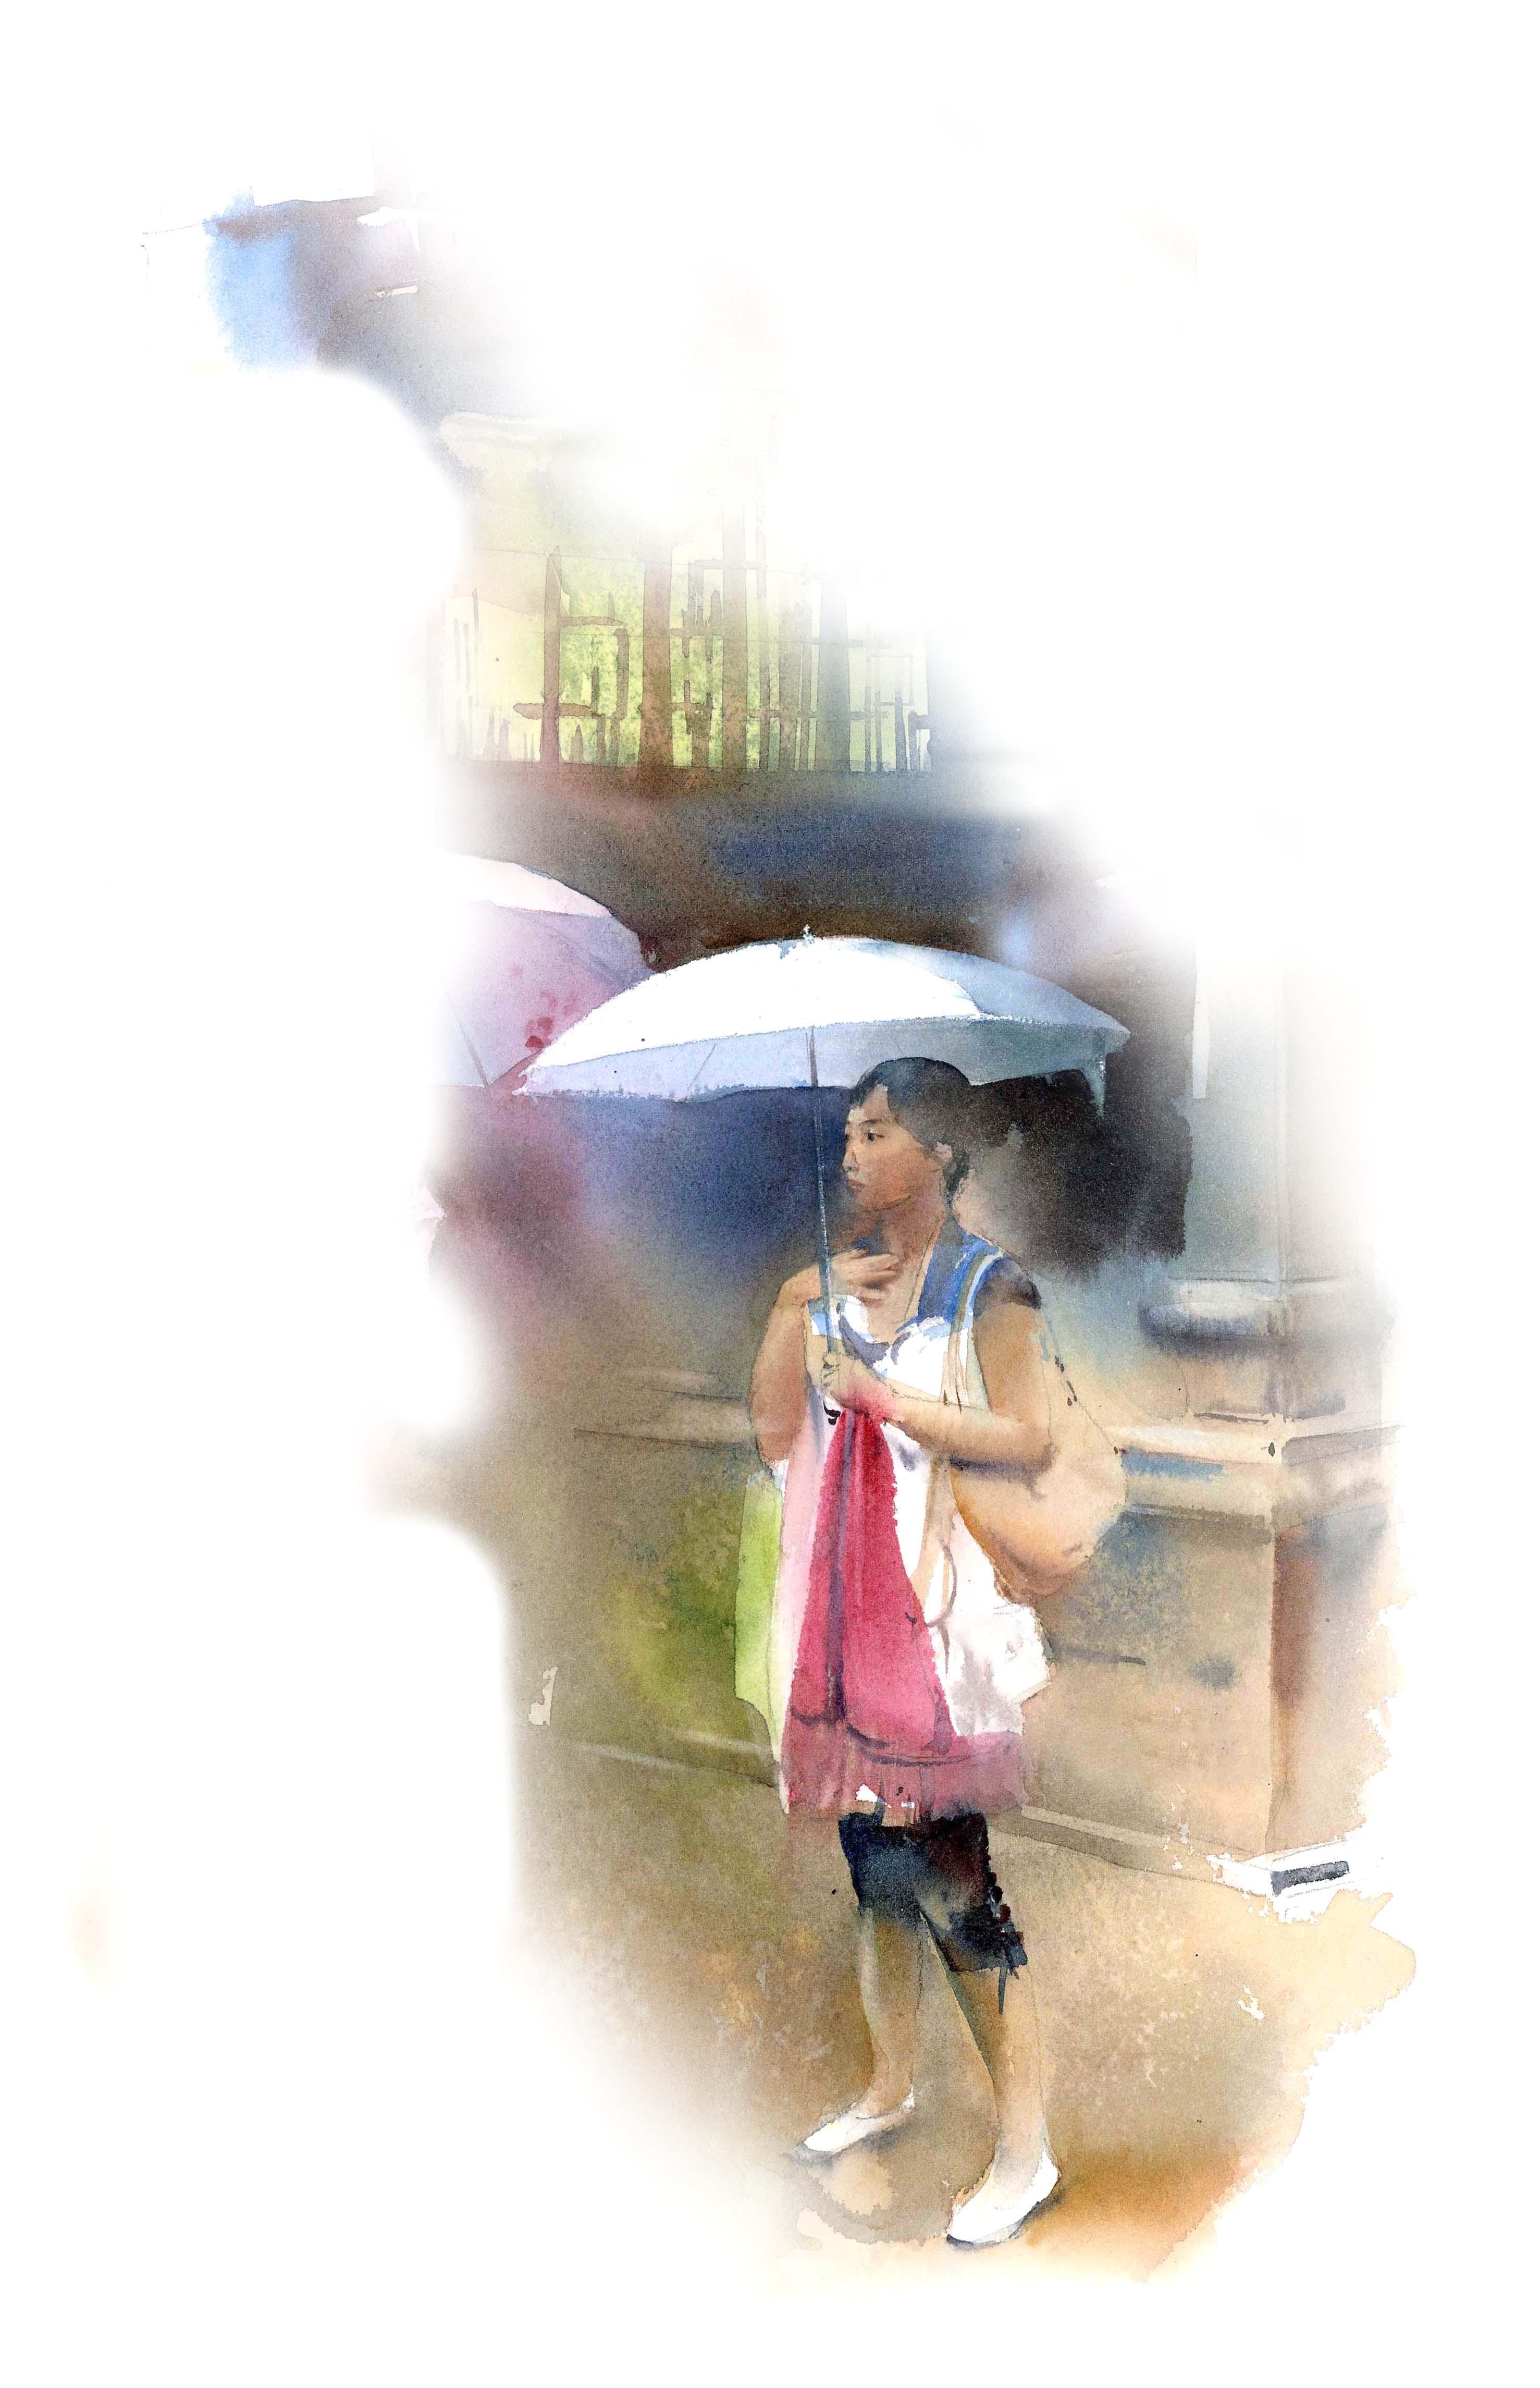 au jadin de Yuyuan à Shangaï